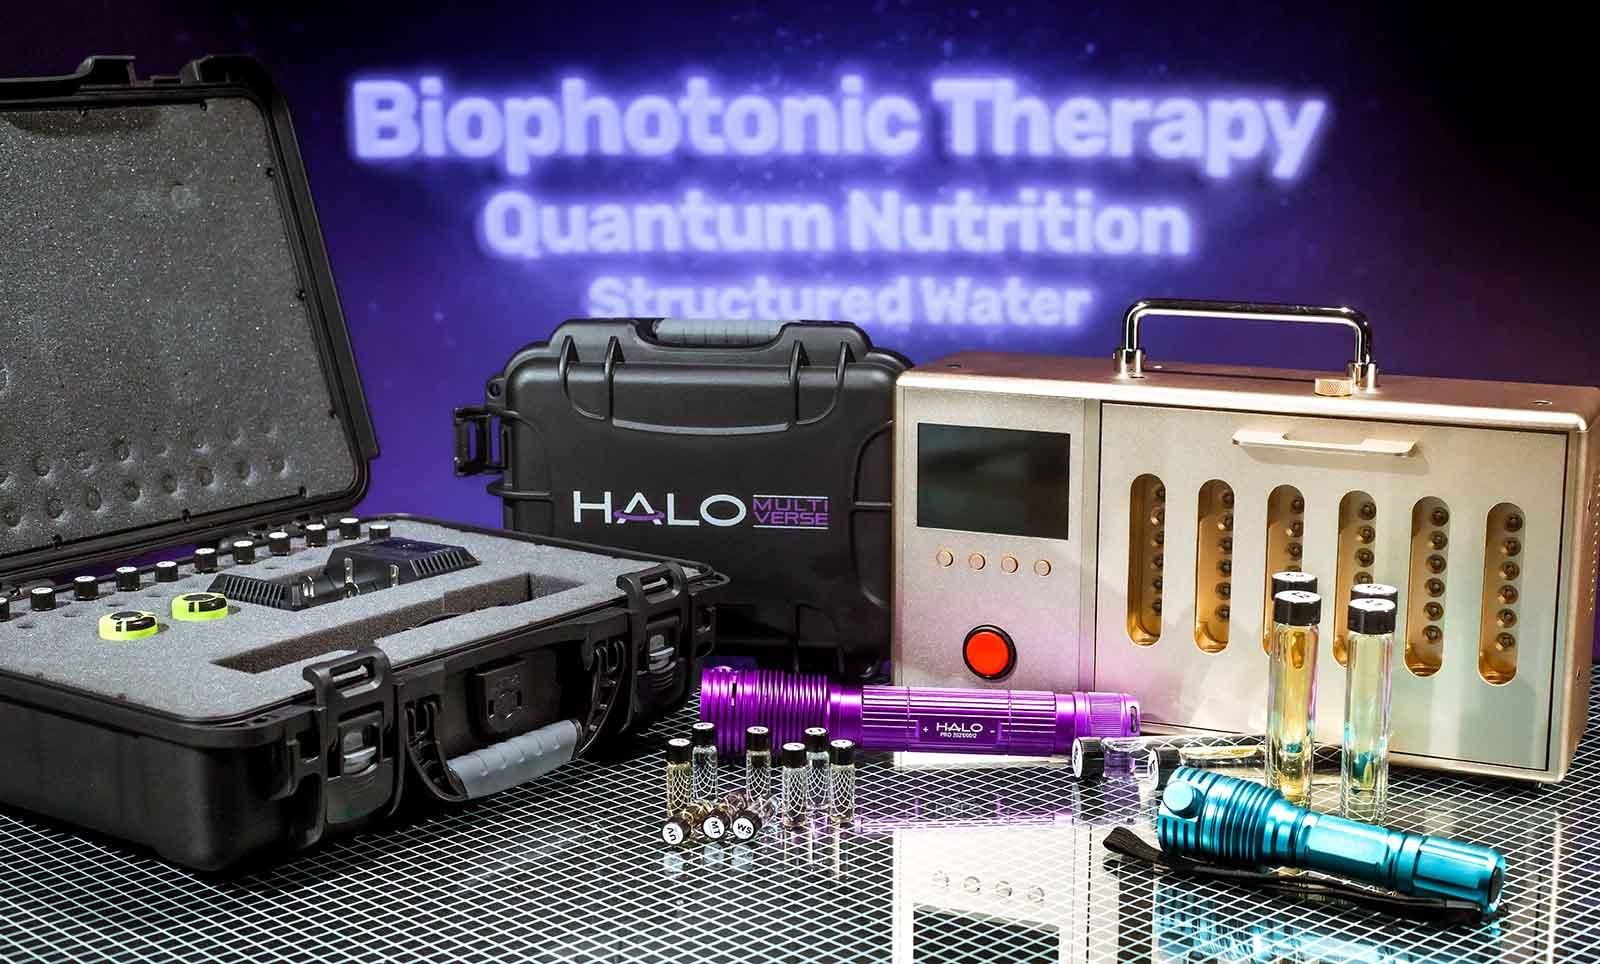 Biophotonic Therapy